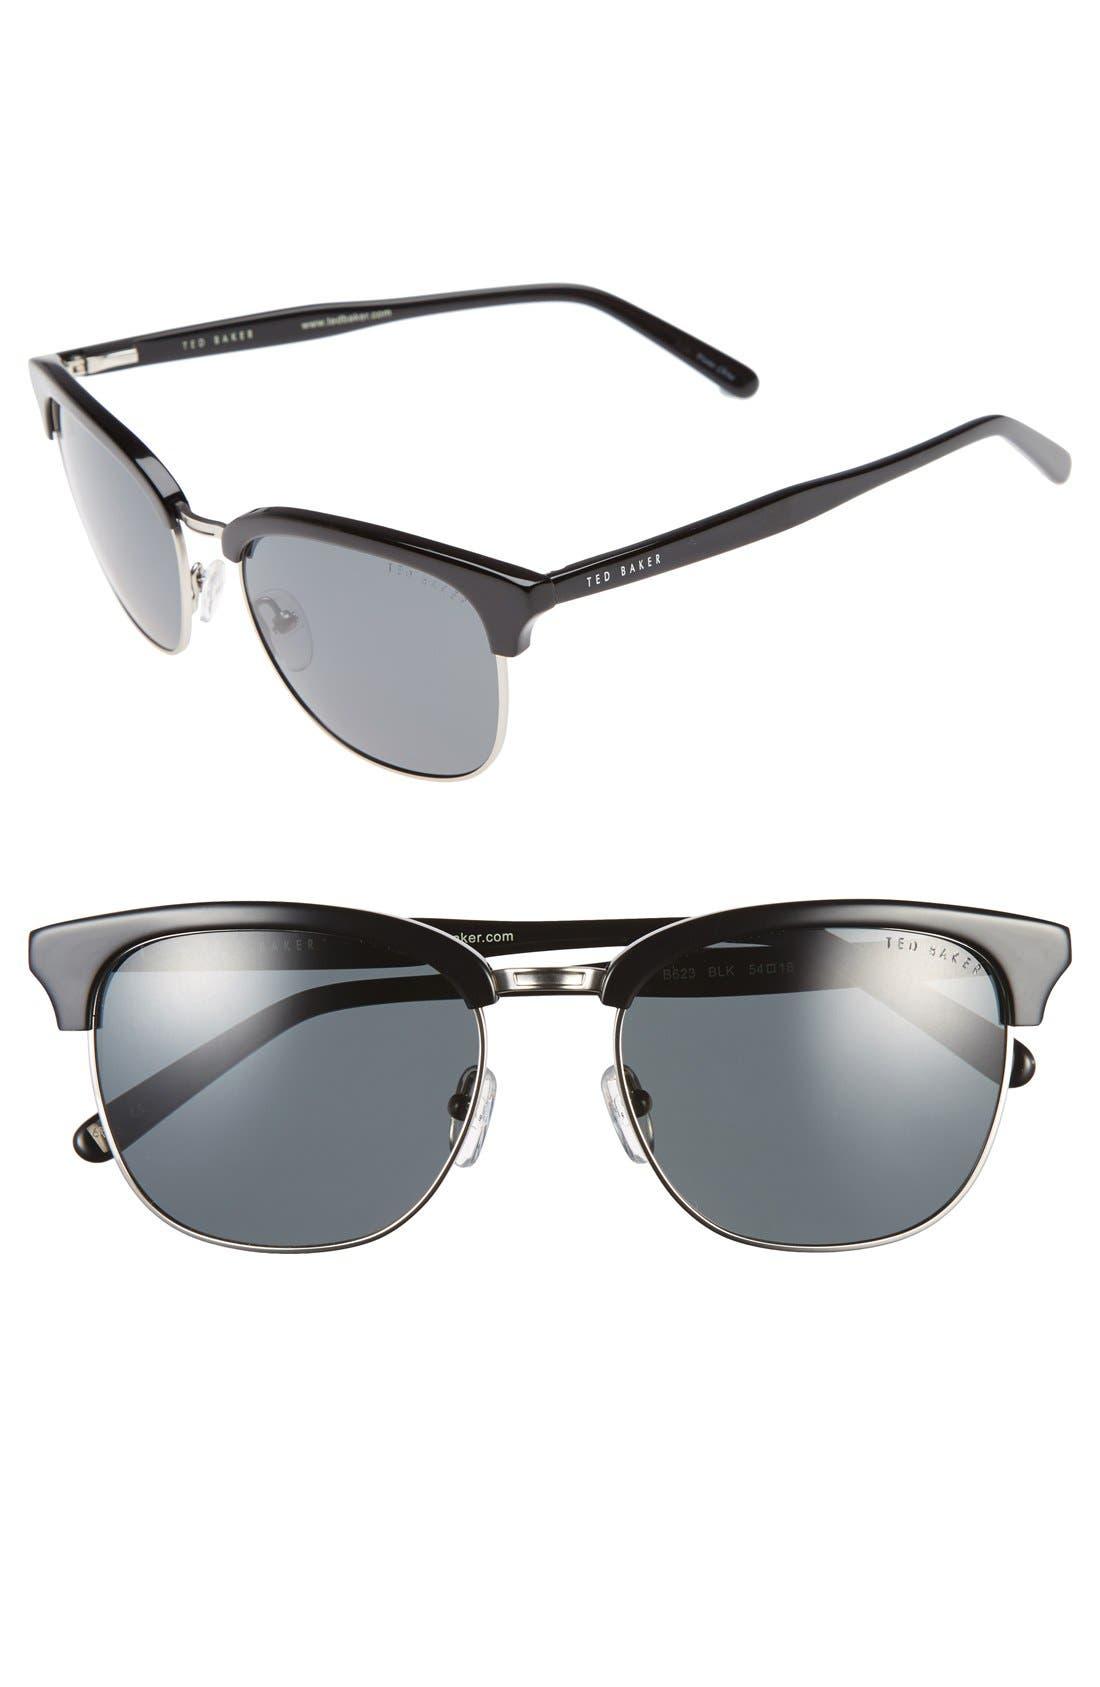 54mm Polarized Sunglasses,                         Main,                         color, 001